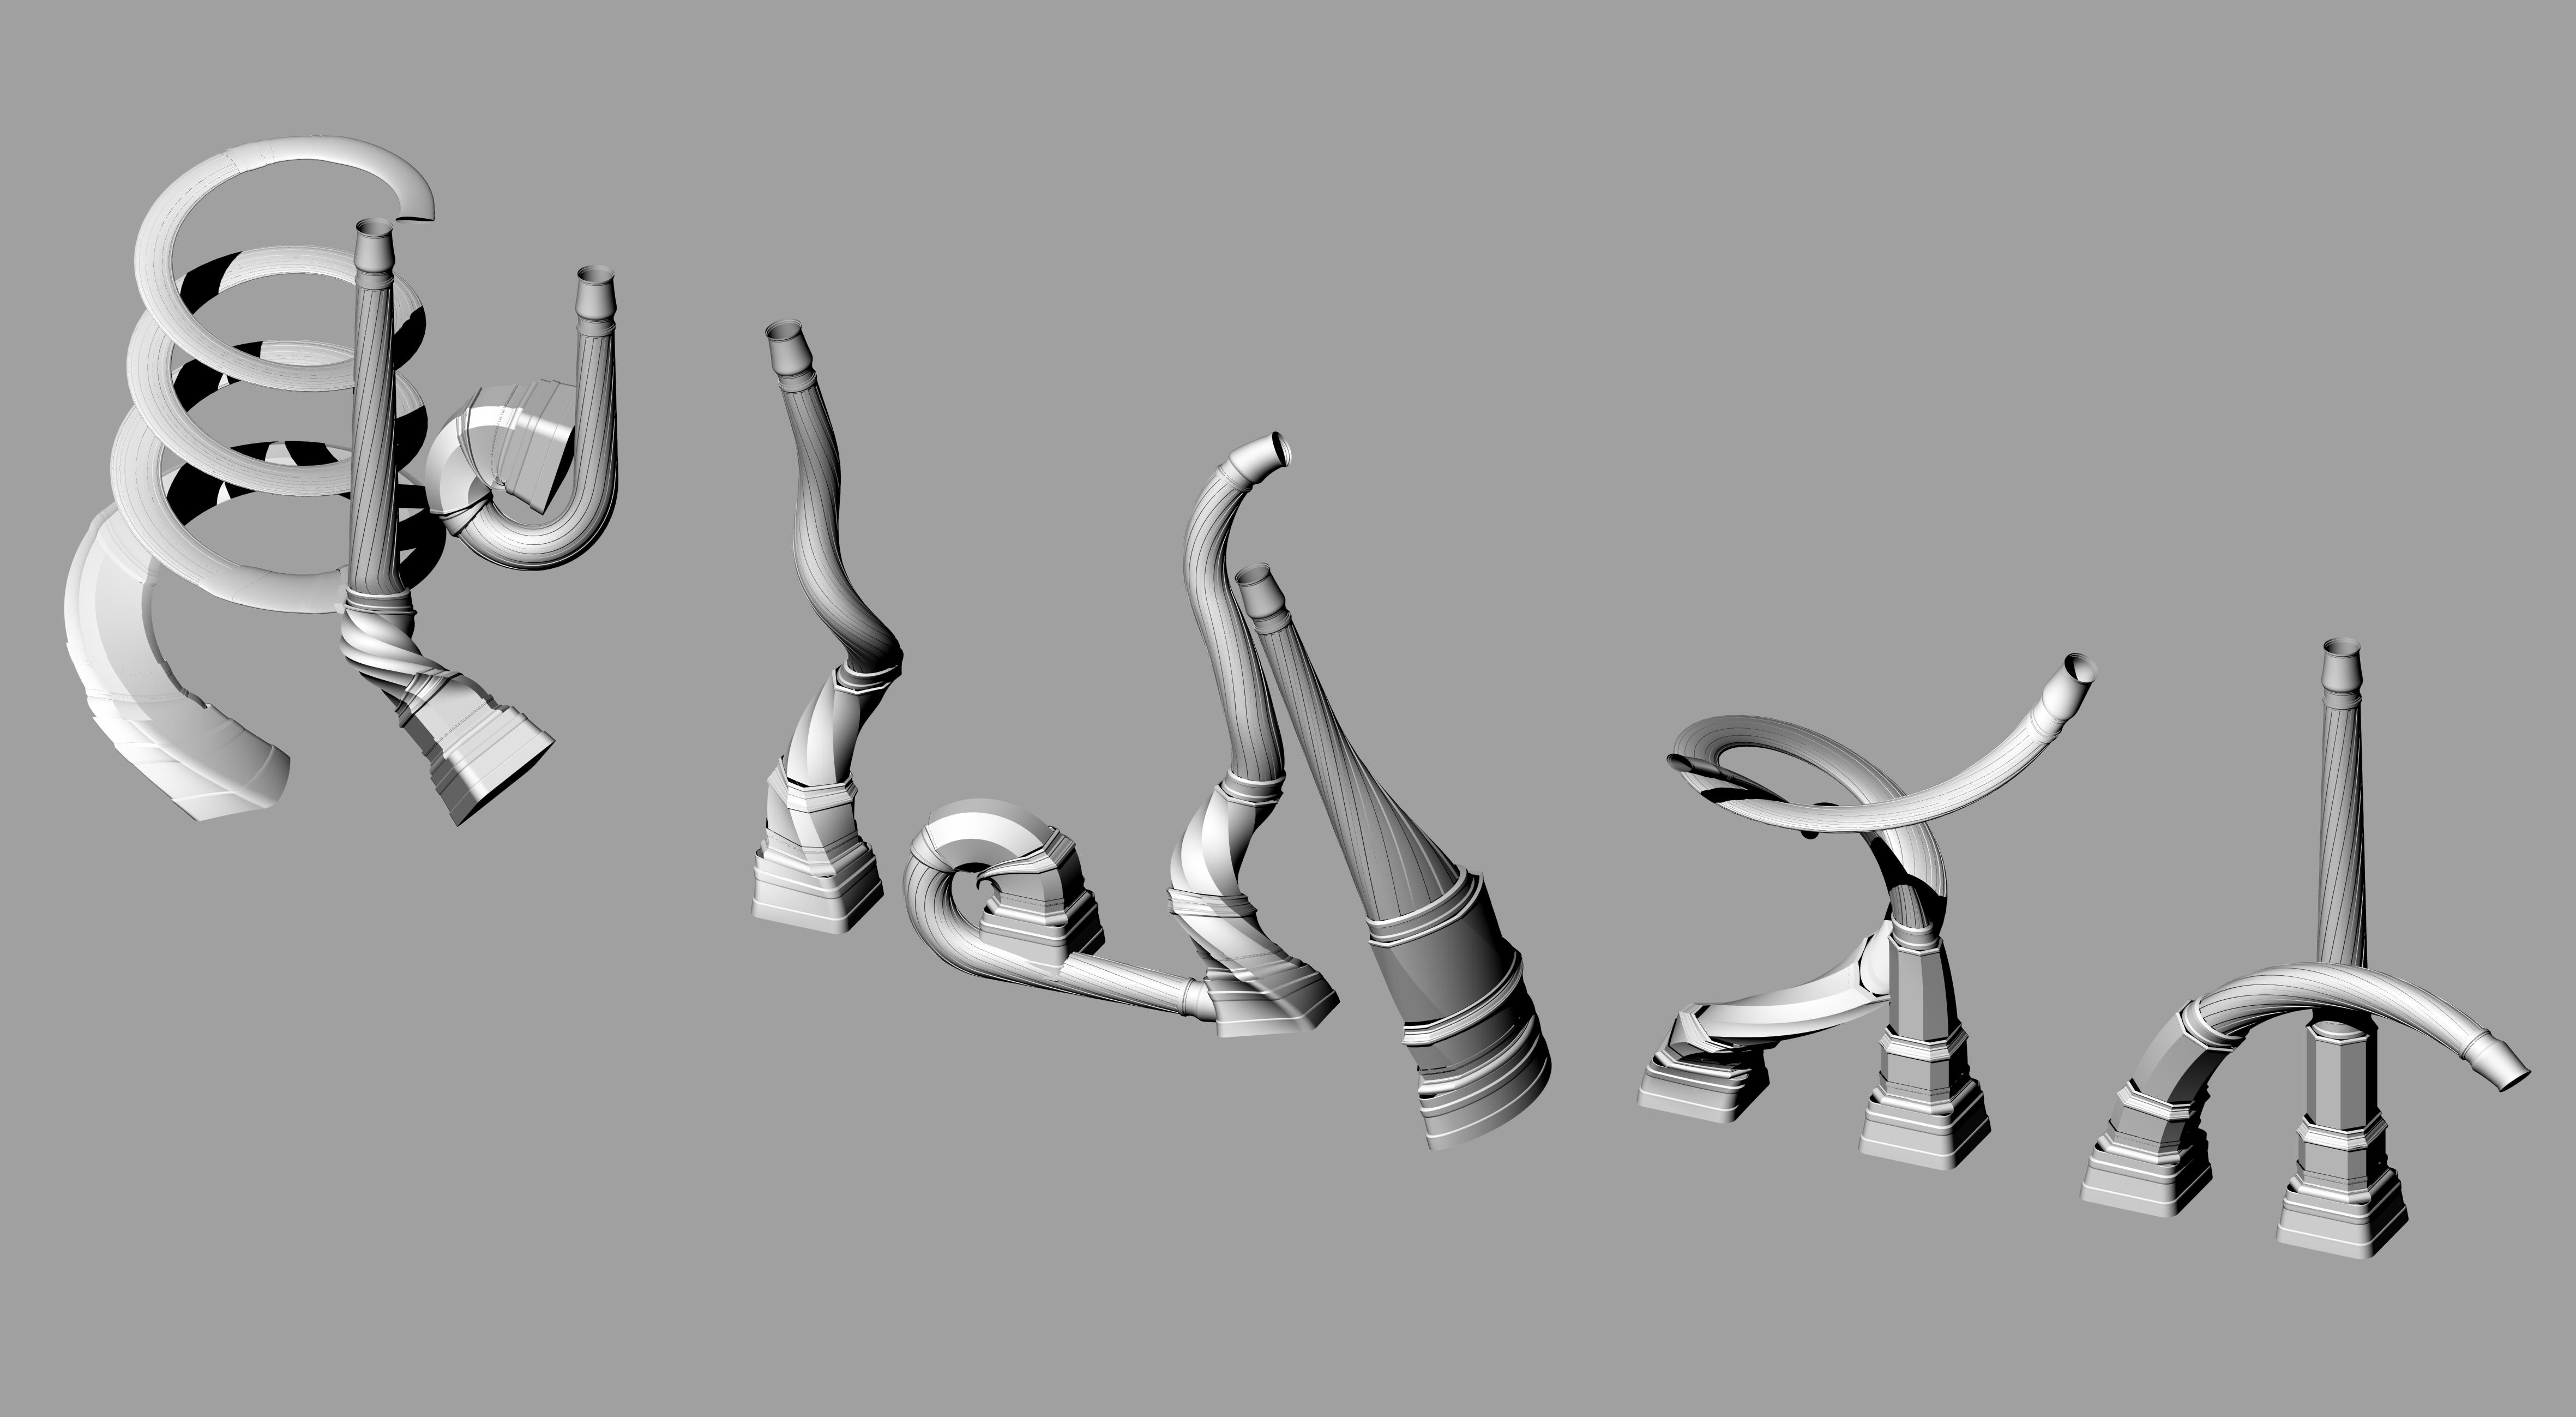 Billedet viser Carlsbergs Skorsten morphet, som om den bevæger sig